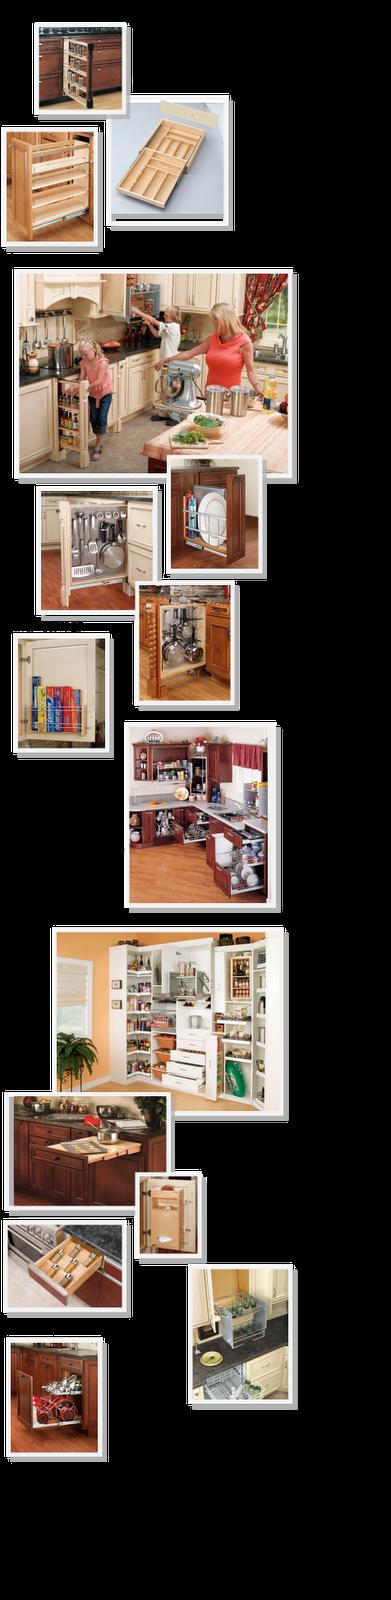 Planning clipart interior decorator. Time design custom cabinetry